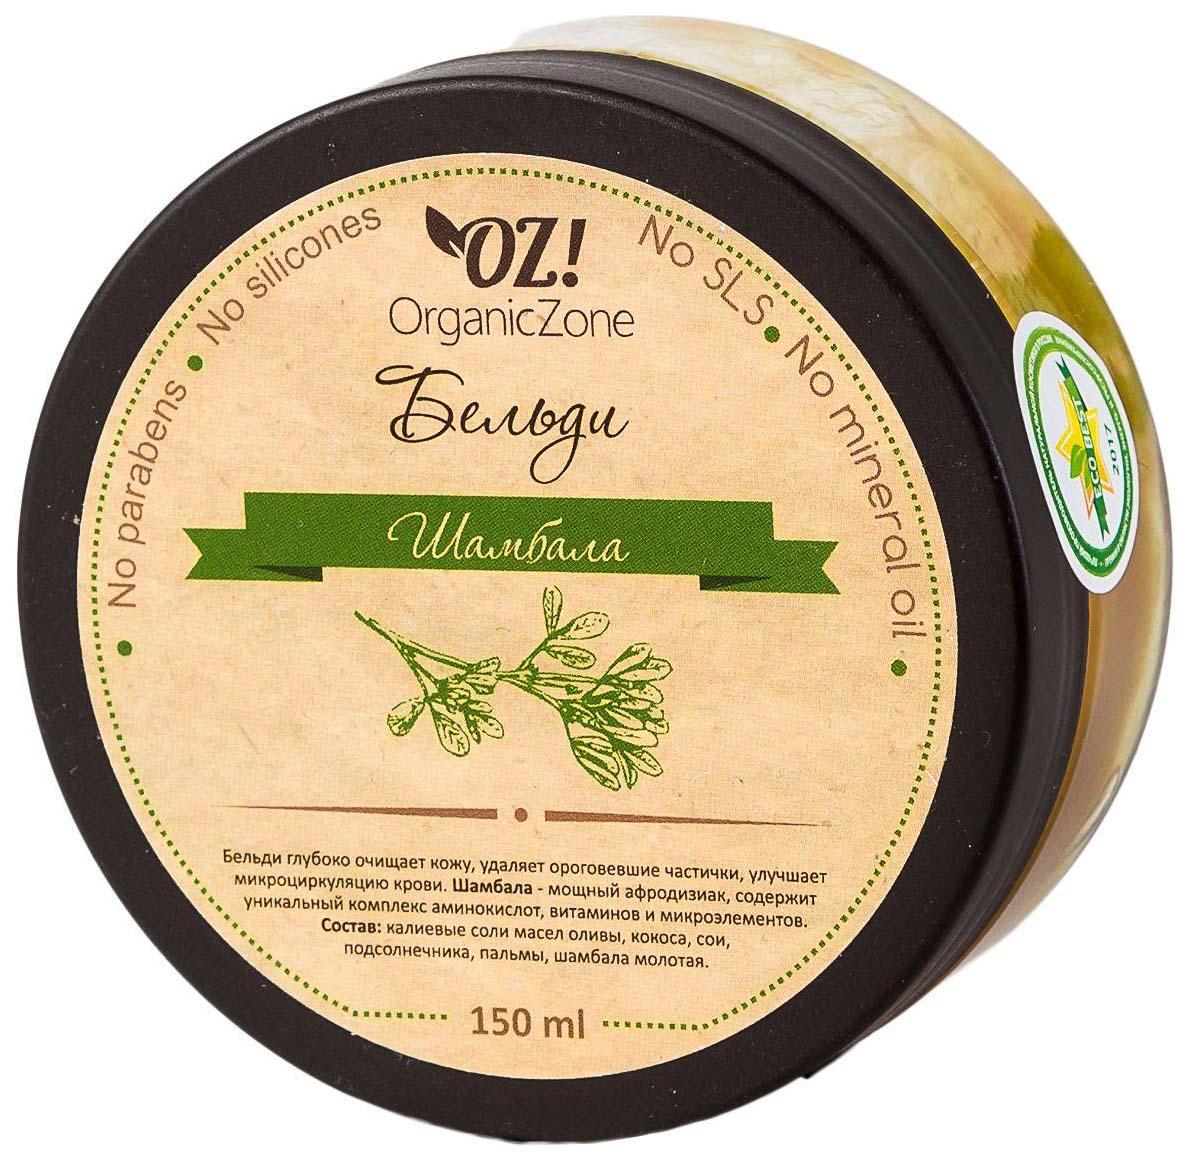 Бельди OrganicZone Шамбала 150 мл